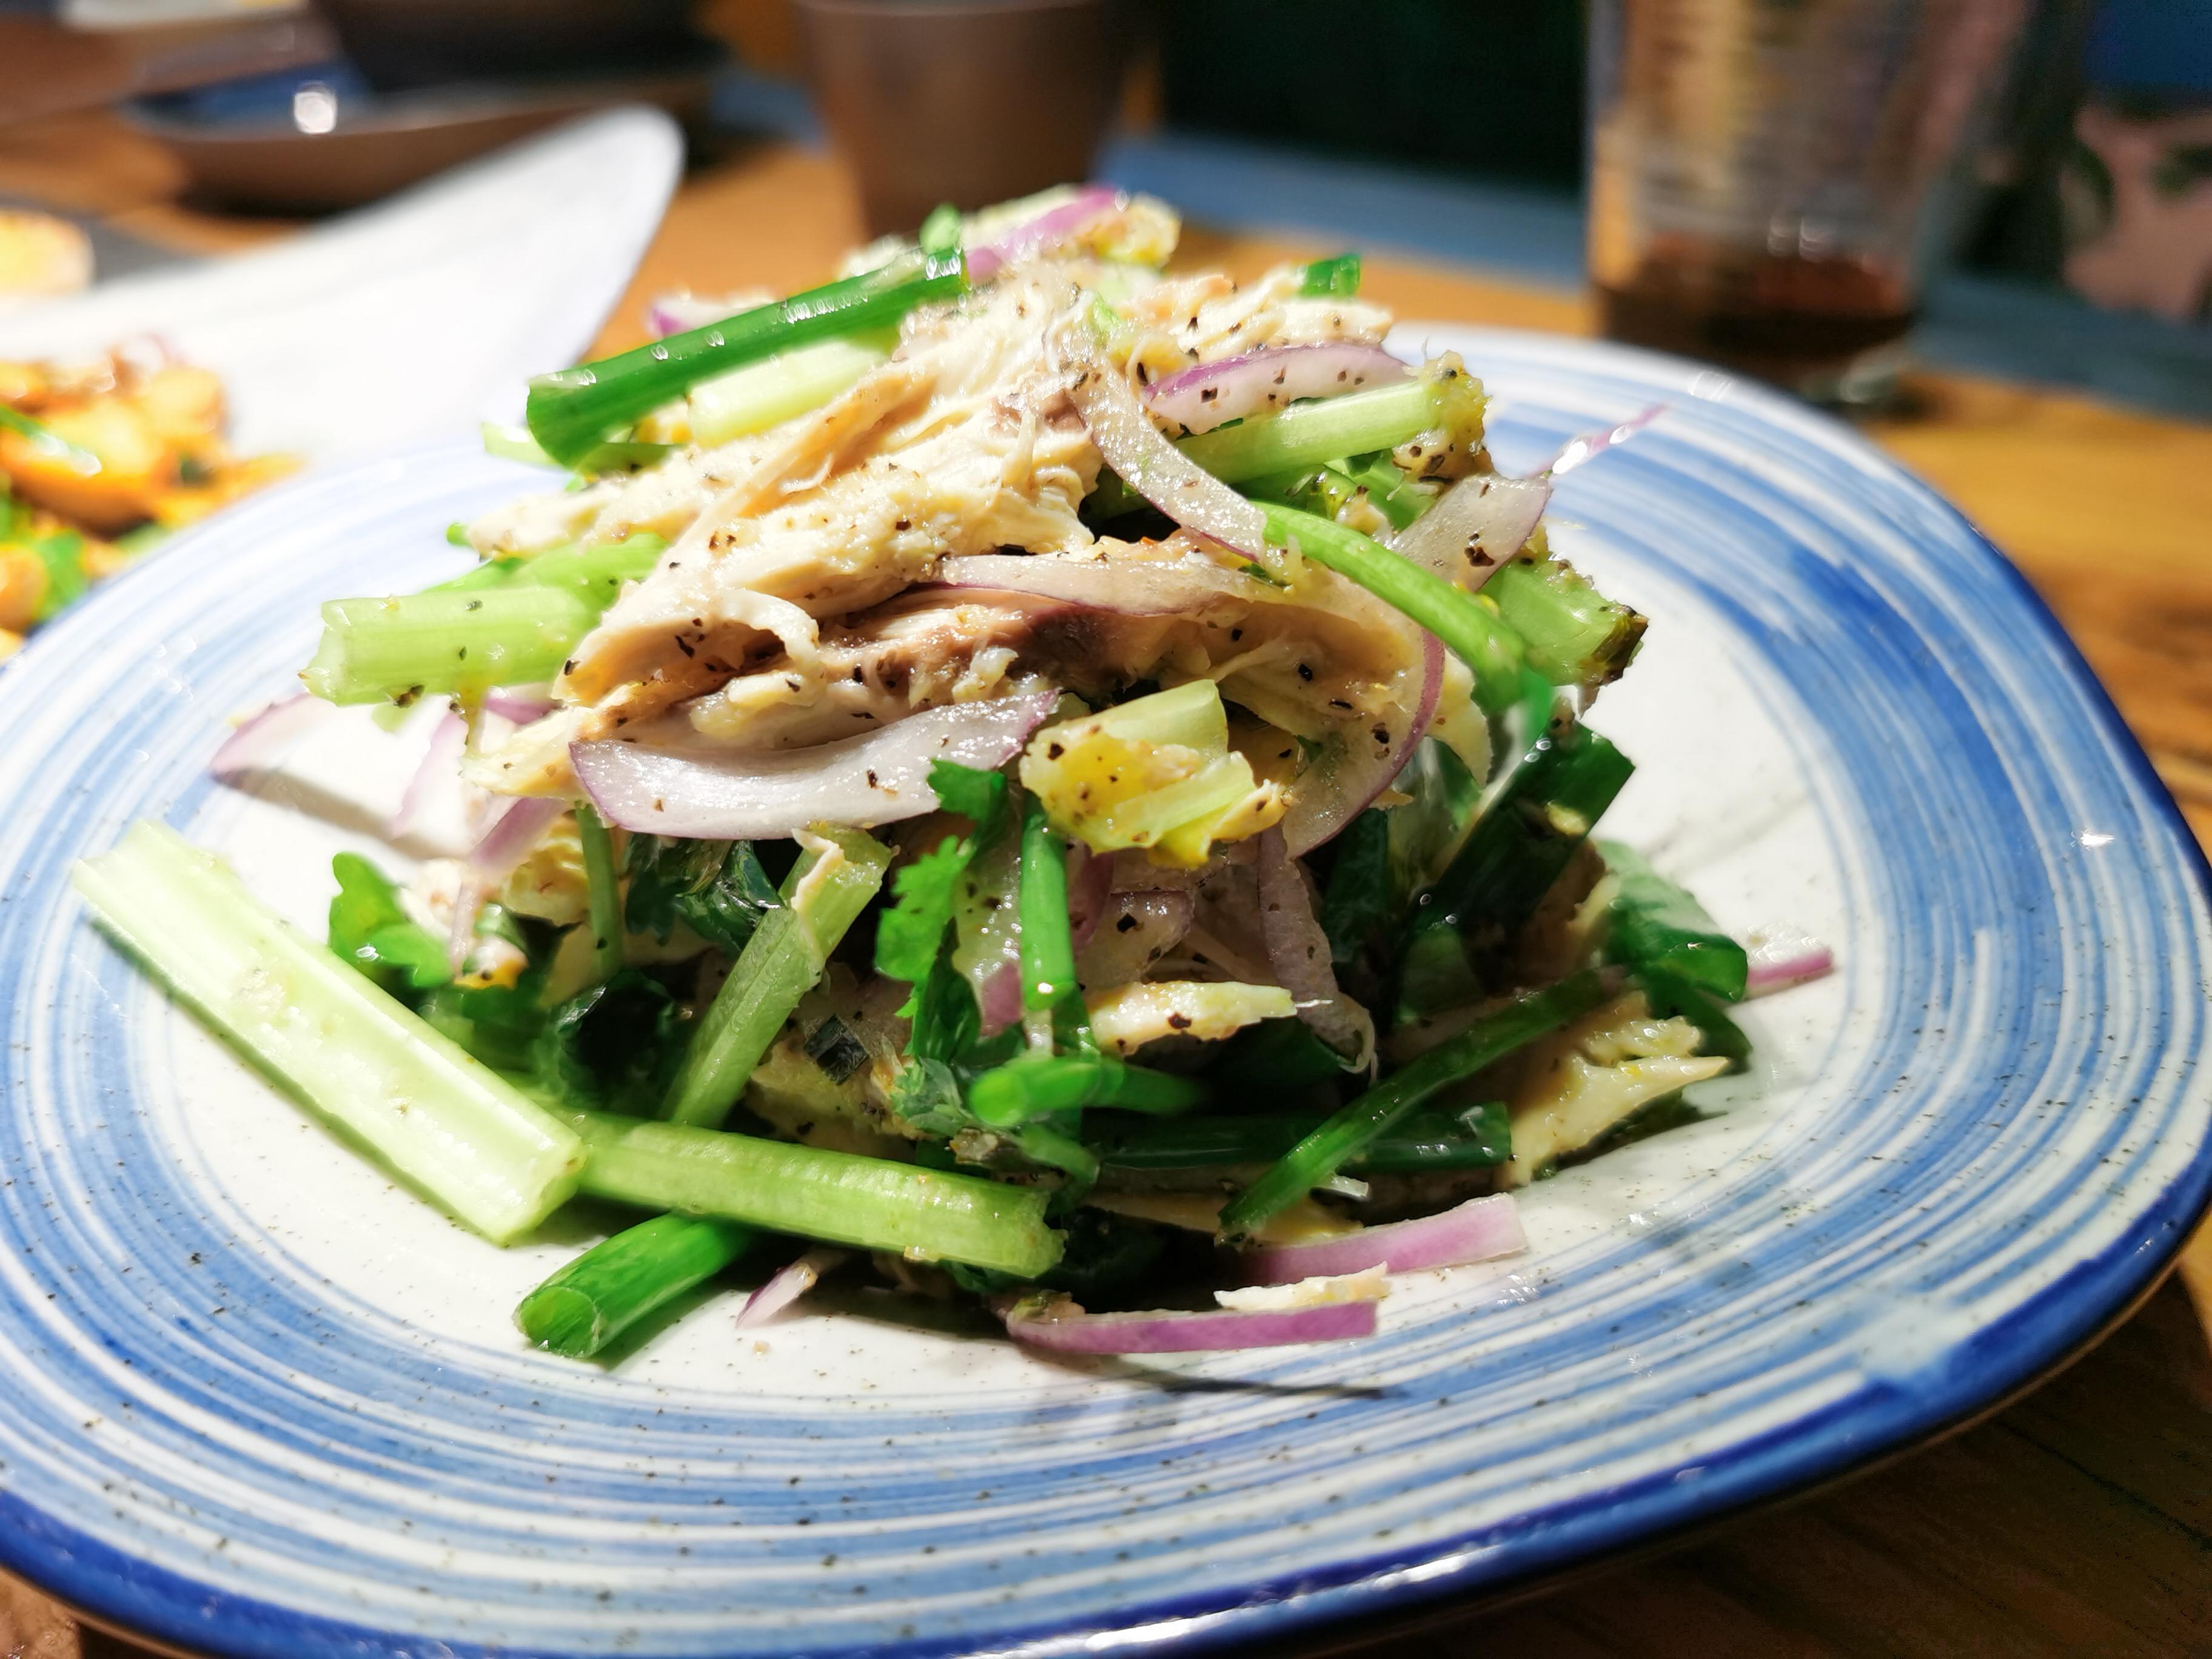 <b>宅在家里,想念外面的菜吗?回味东南亚菜</b>